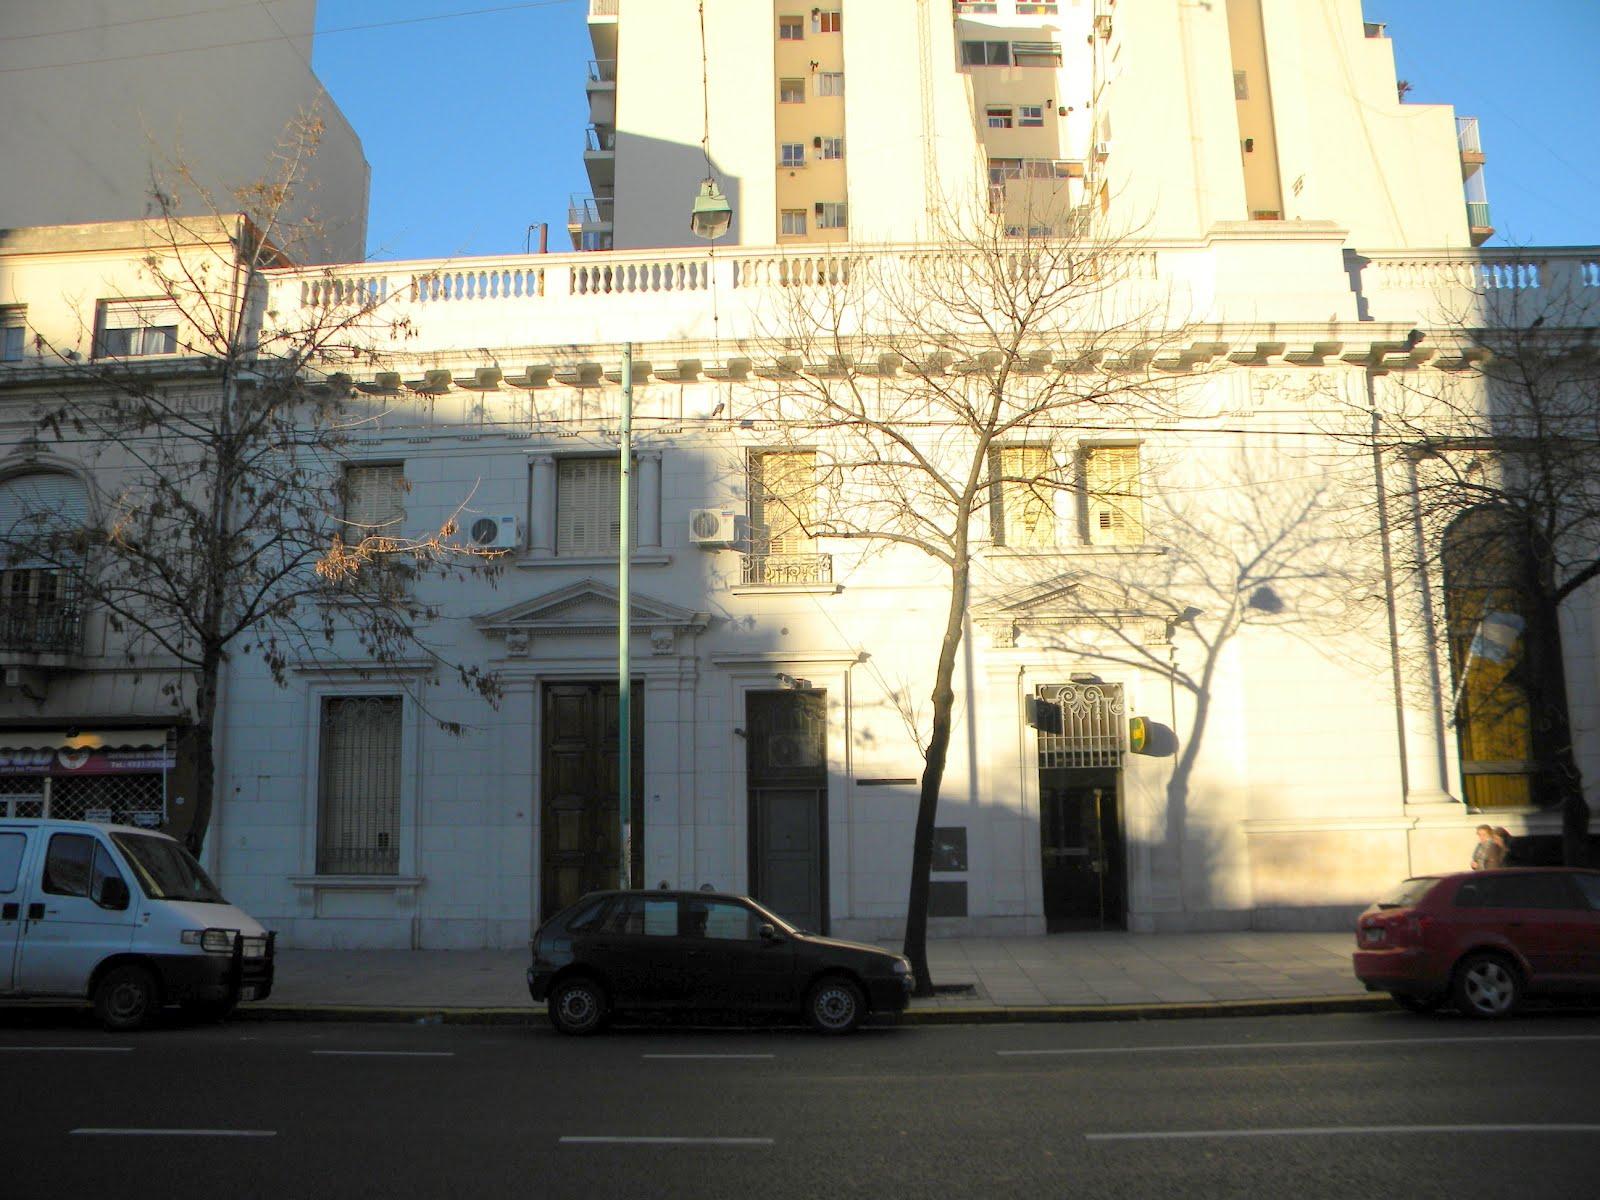 Arquitectos espa oles en argentina y espa a arq manuel - Arquitectos en espana ...